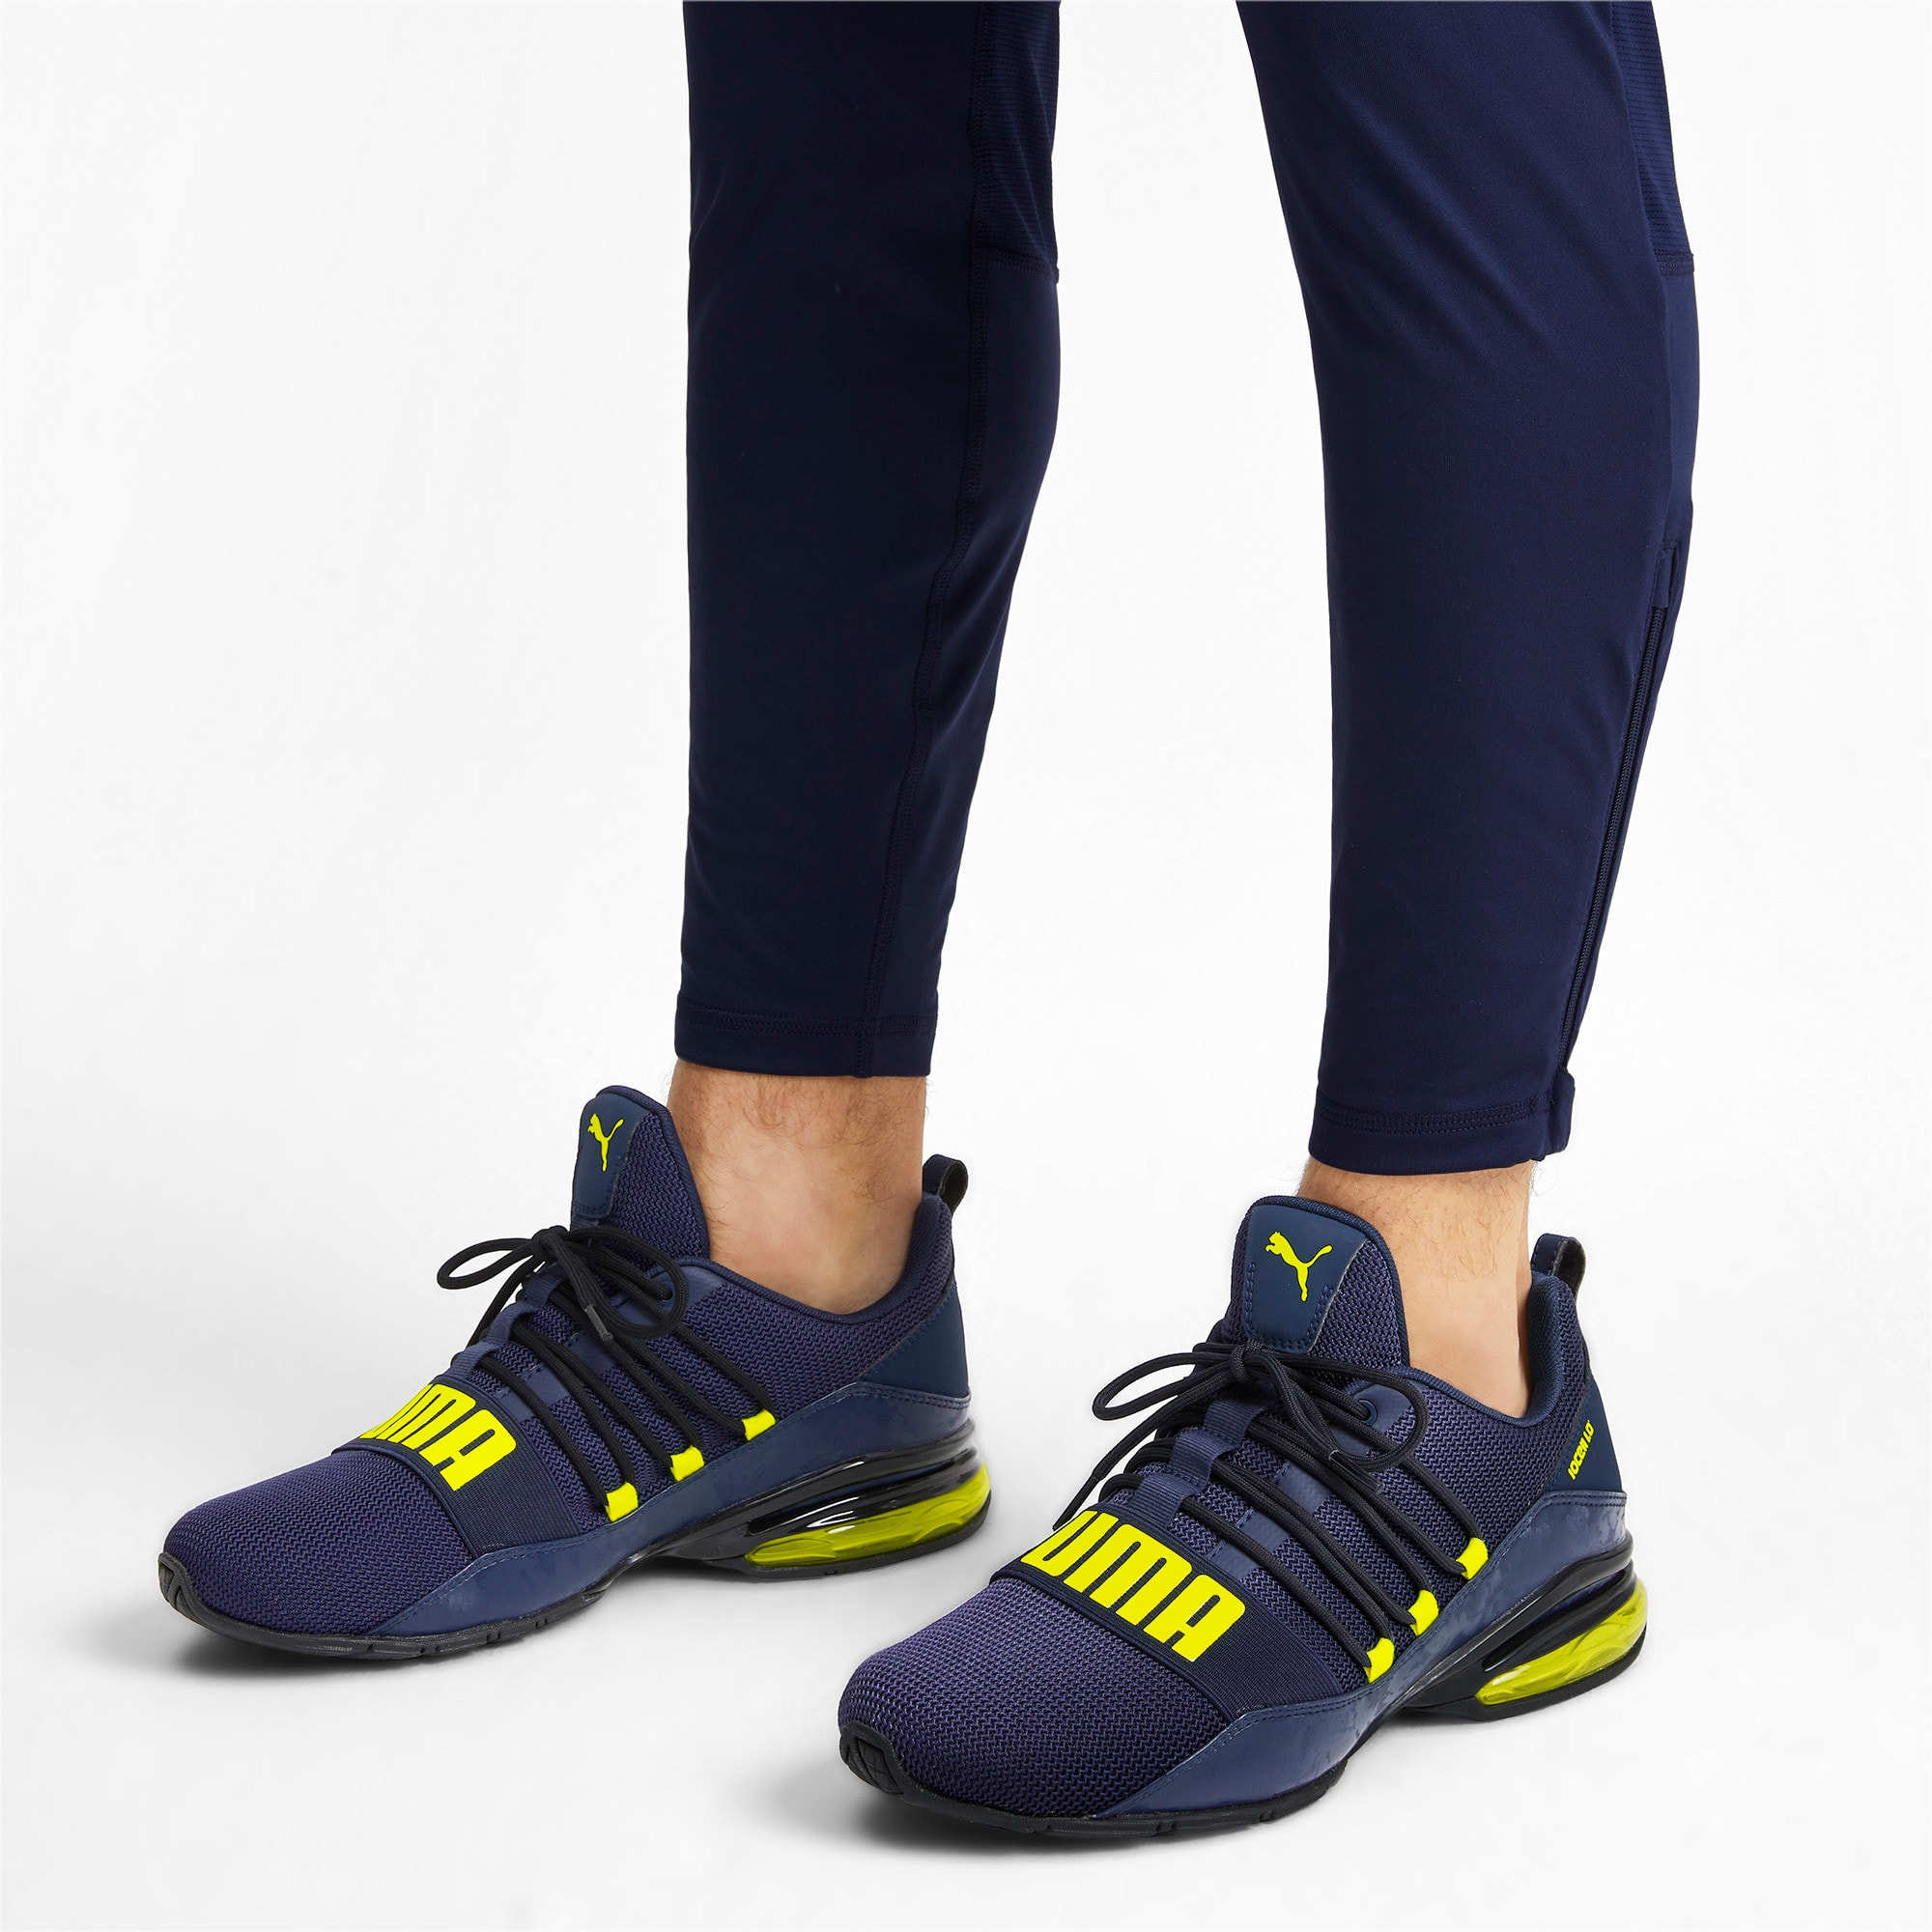 Thumbnail 2 of Cell Regulate Camo Men's Running Shoes, Peacoat-Yellow Alert, medium-IND